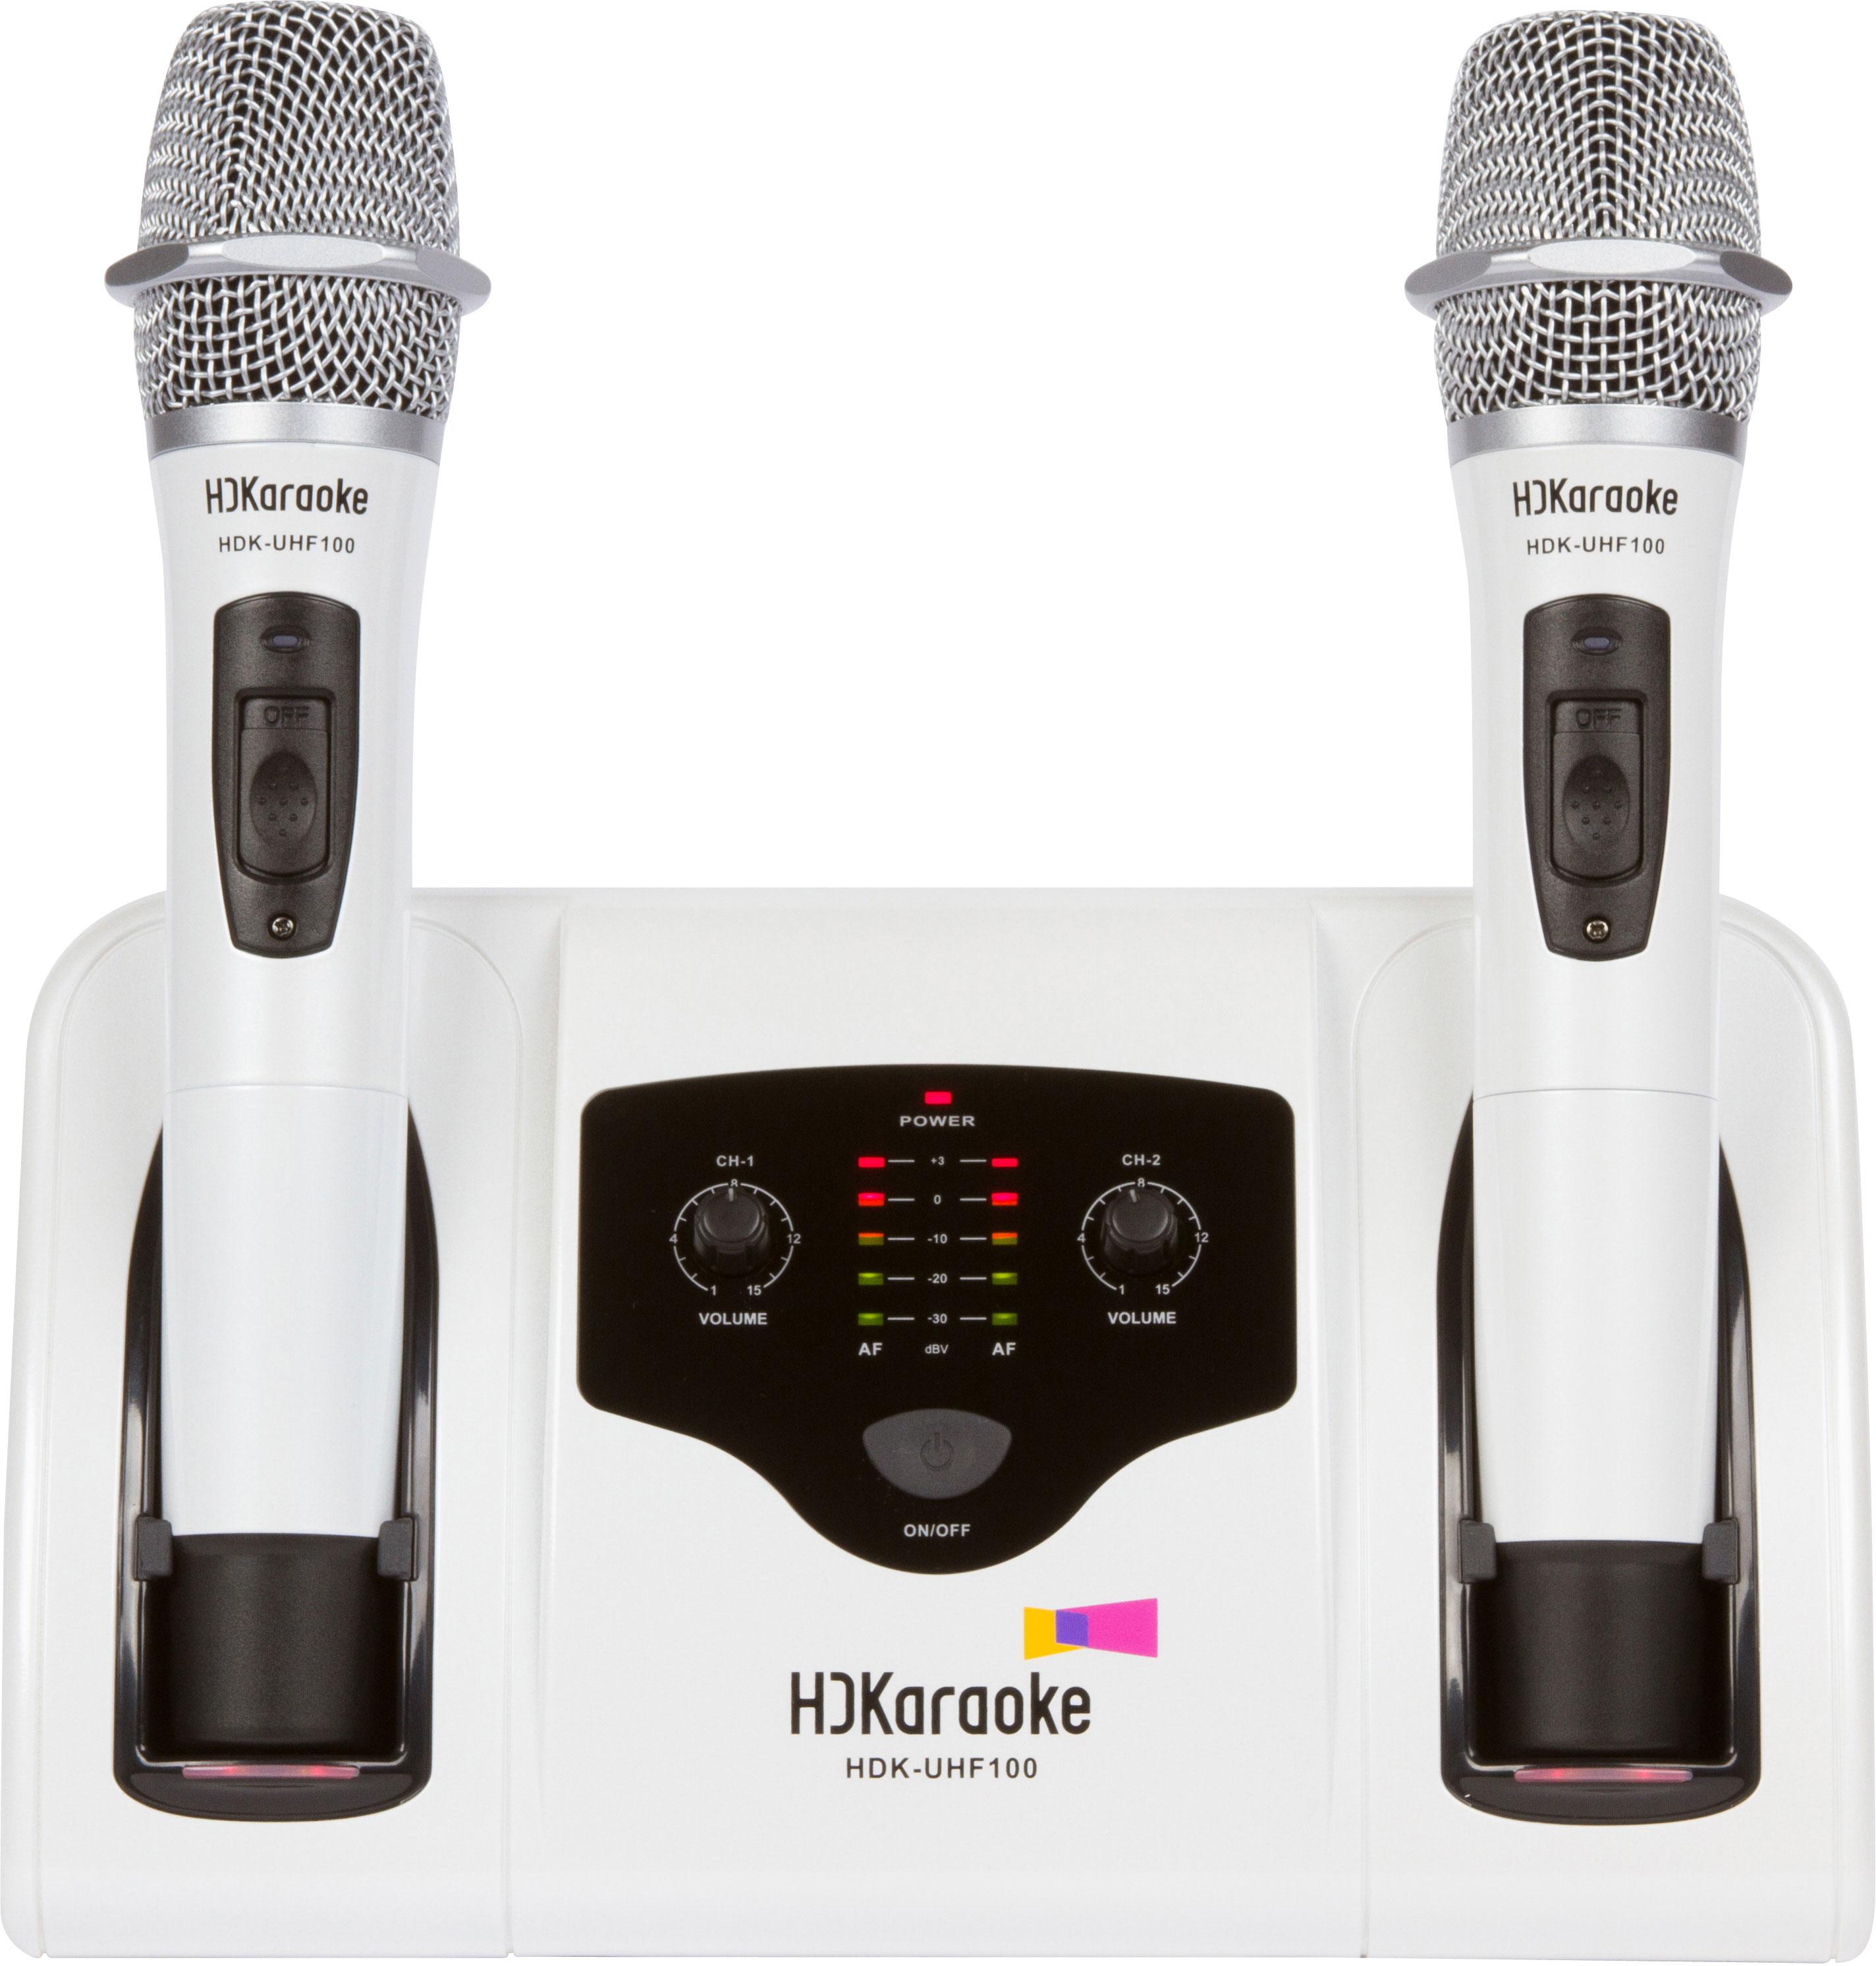 hdkaraoke uhf 100 dual channel rechargeable wireless microphone system 1 pair hdkaraoke. Black Bedroom Furniture Sets. Home Design Ideas